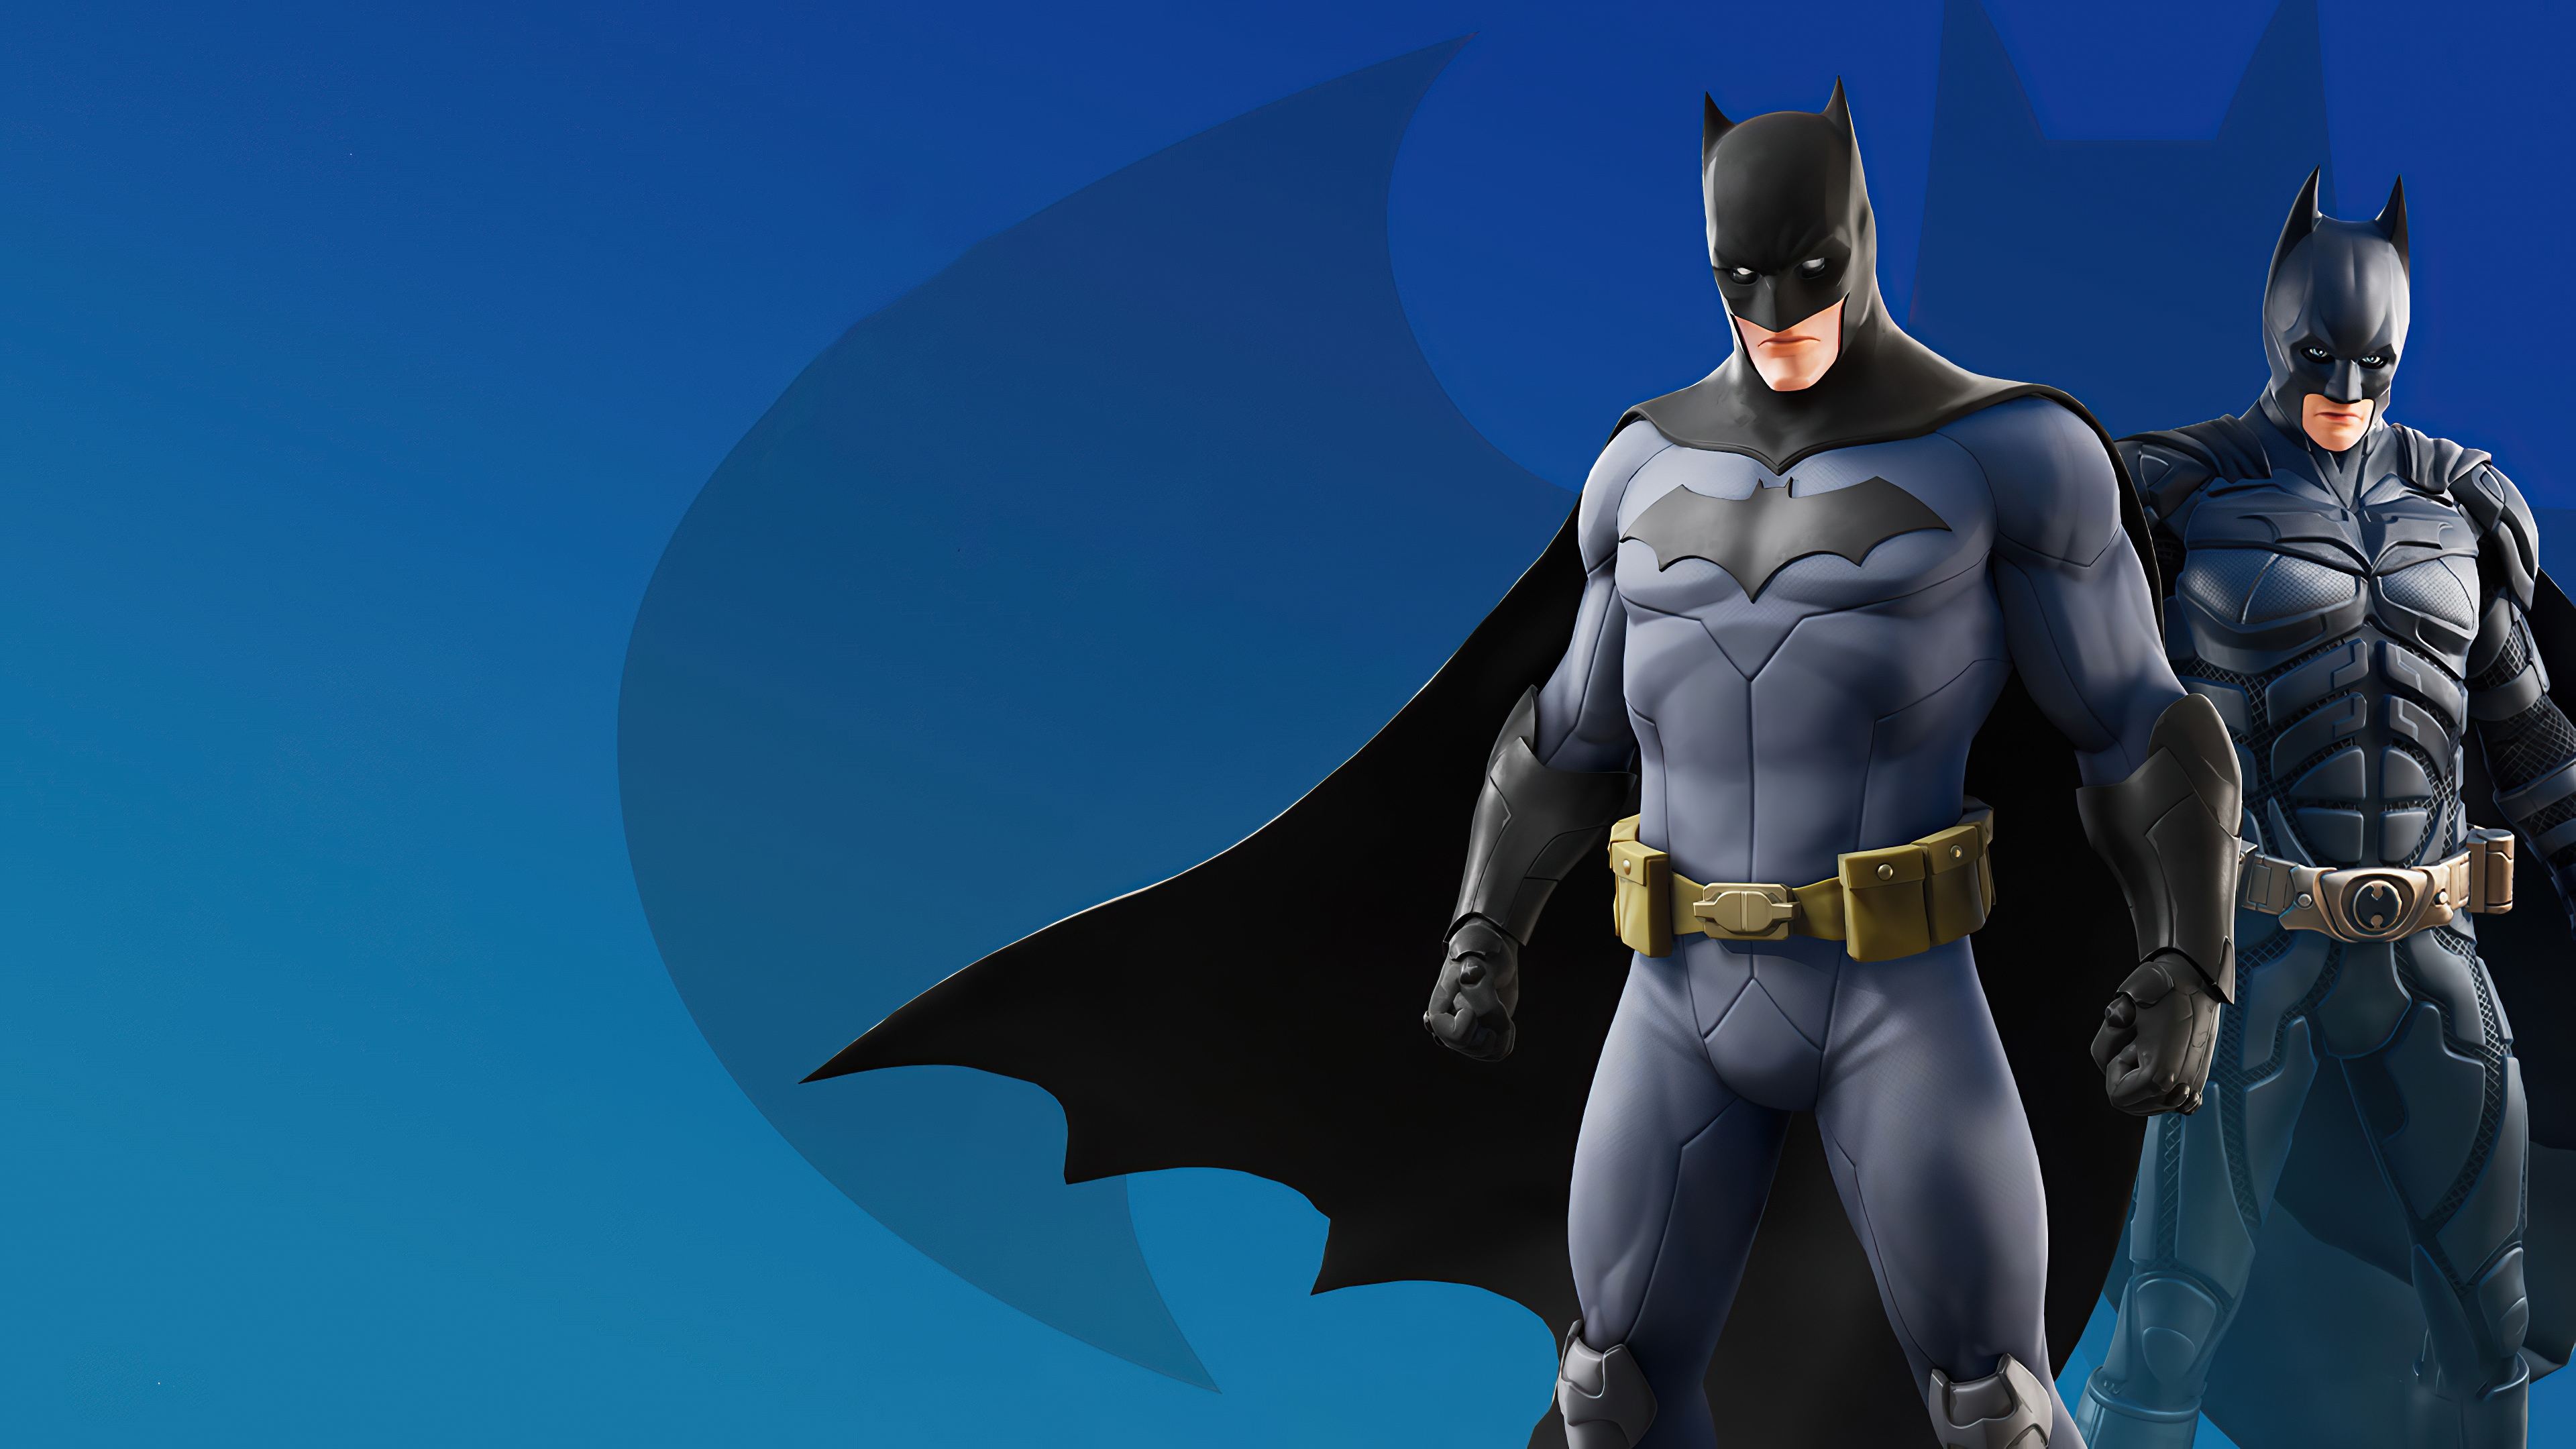 Fortnite - Armored Batman Zero Skin Bundle (PC) - Epic Games Key - GLOBAL - 1